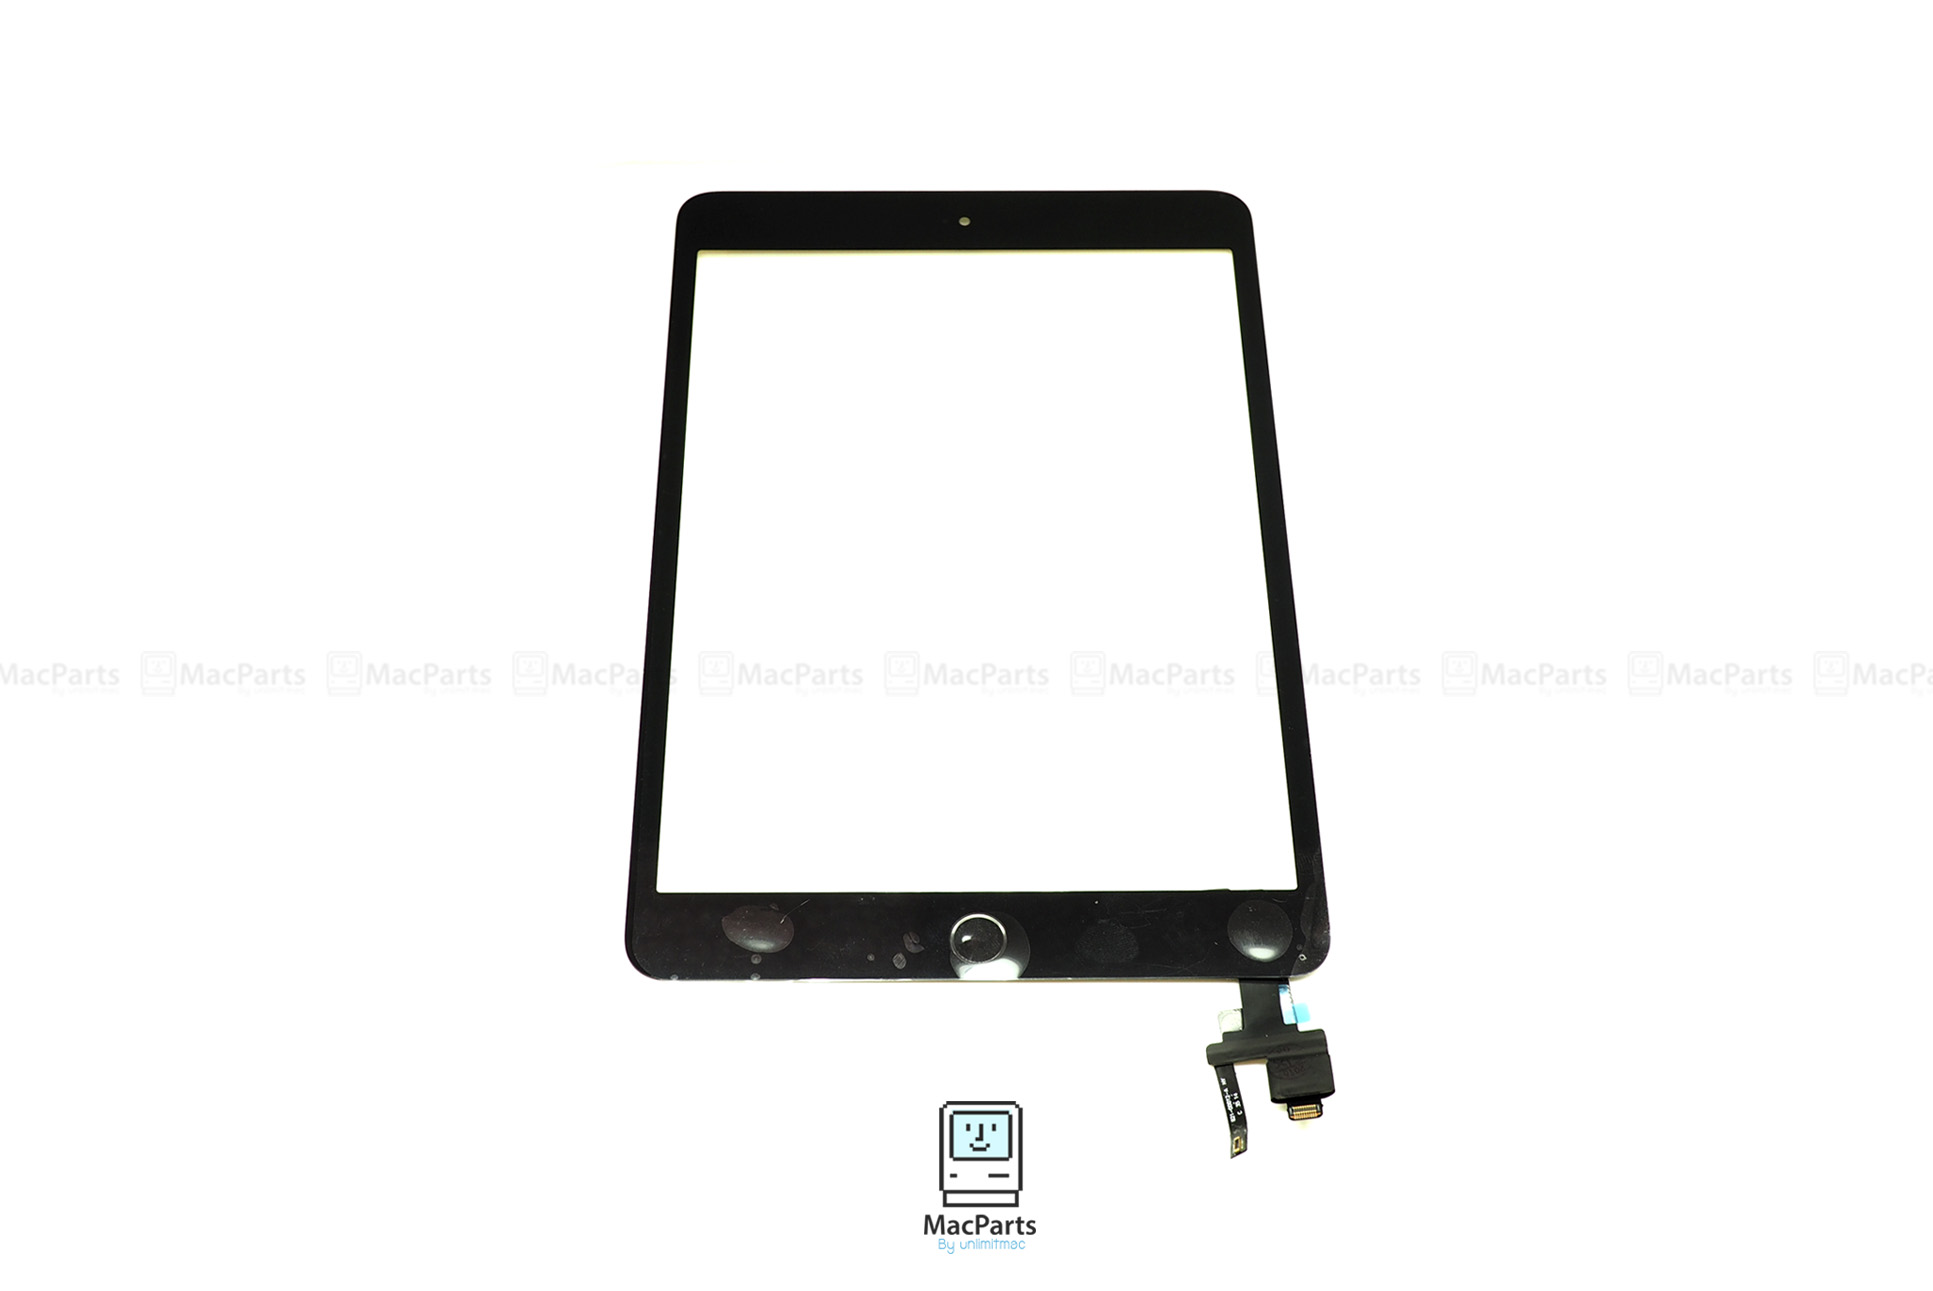 Touch Screen Panel iPad Mini 3 Generation (Black) + IC Chip And Home button , Touch ID Button ชุดทัชสกรีน iPad mini 3 พร้อมชุดปุ่ม โฮม,ทัชไอดี และ IC Chip